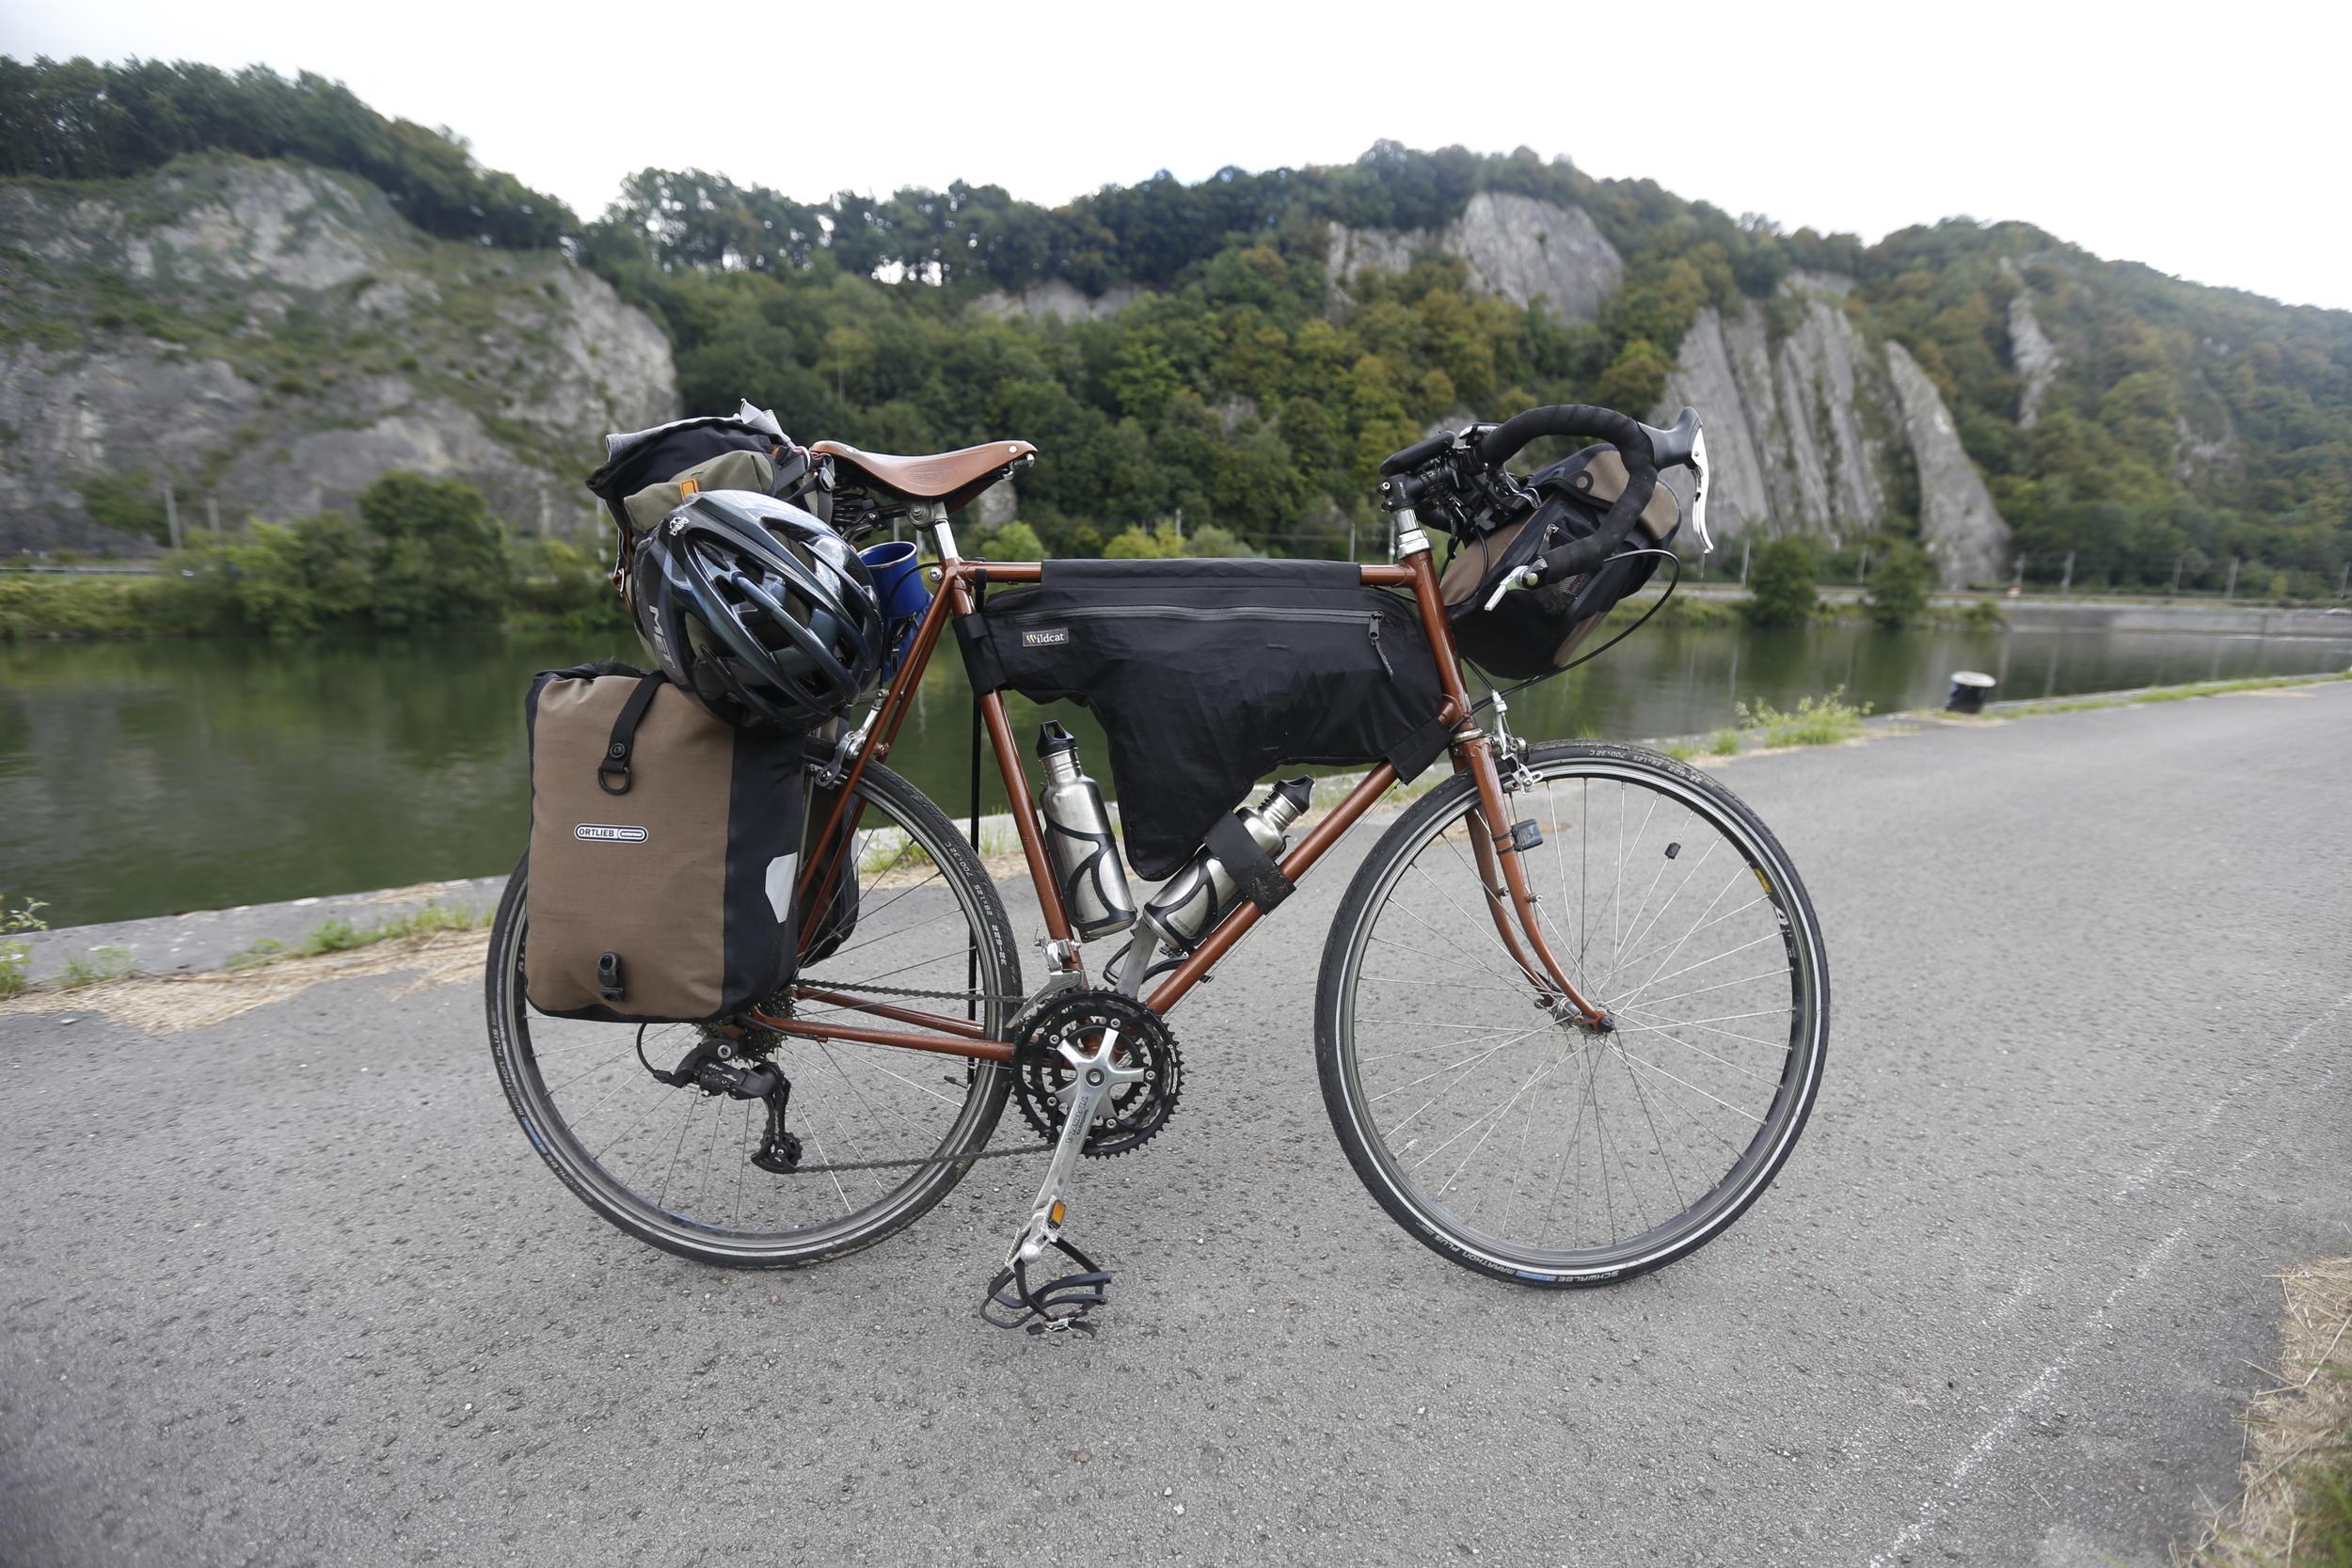 raleigh, raleigh magnum, racing bike, tourer, touring bike, custom touring bike, bikepacking, cycle touring, cycle gear, travel, photography, travel photography